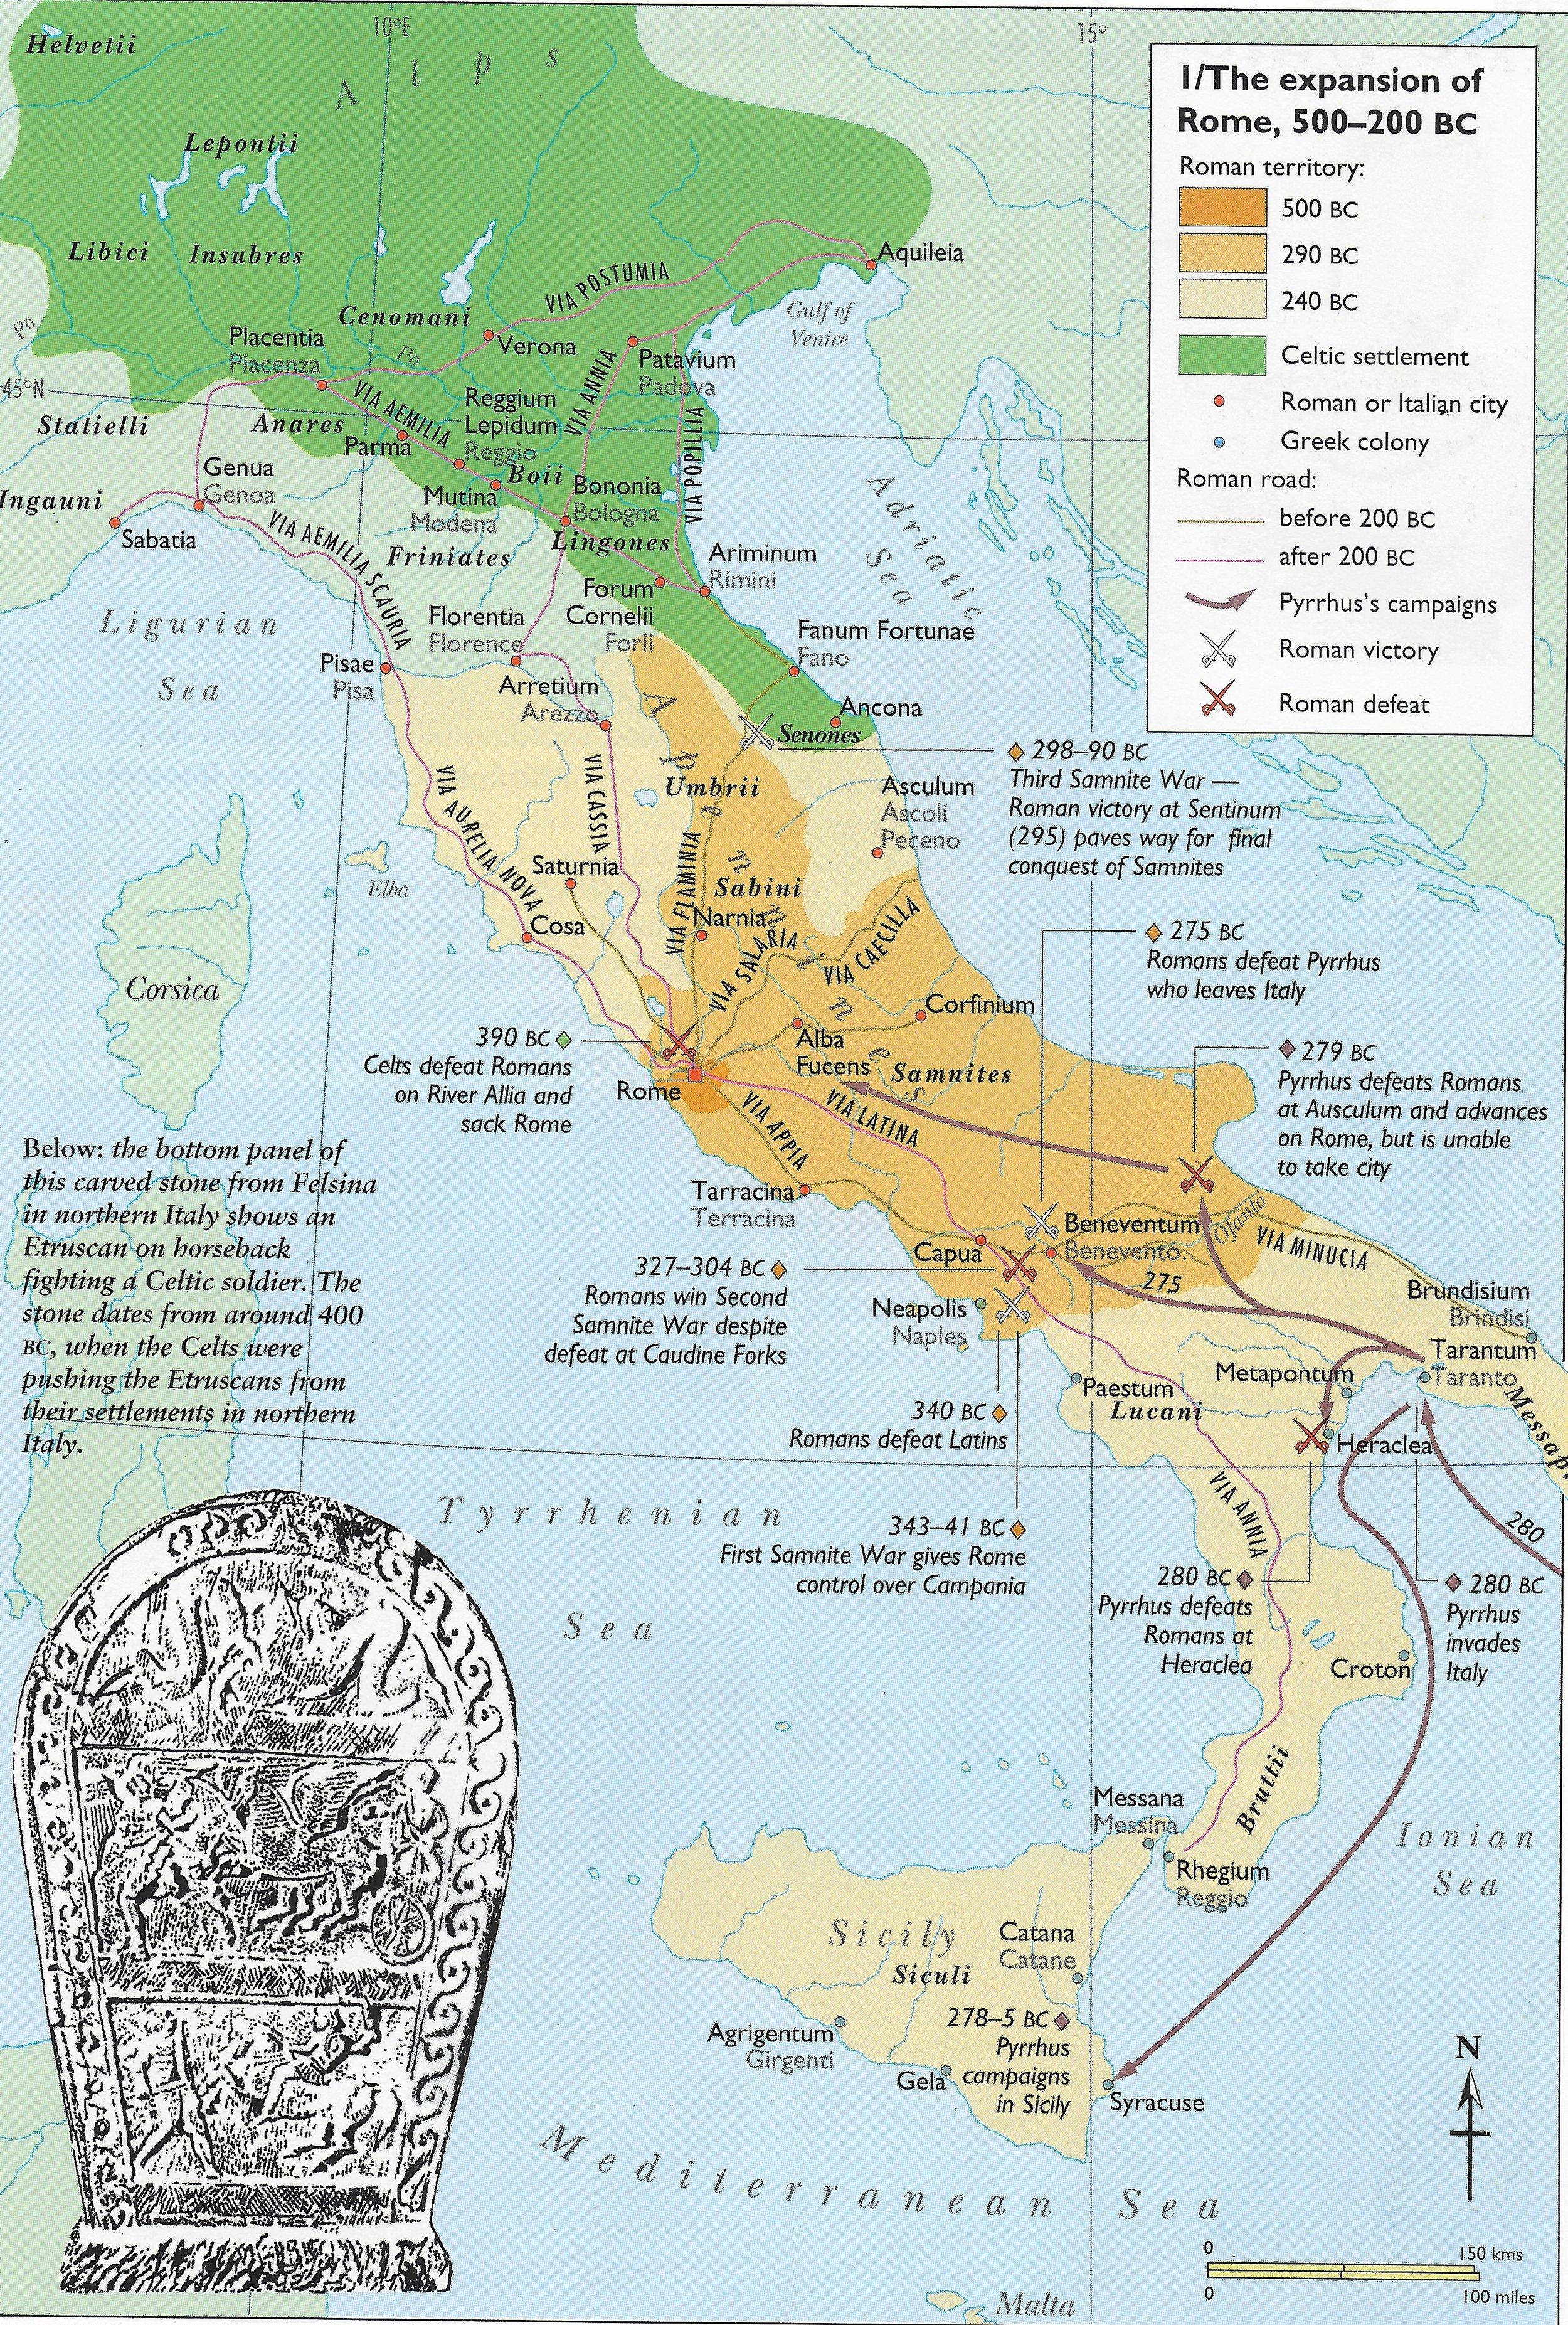 Latin II 2016-7 Map of Italy Italian Peninsula down to 200 BC conquest.jpeg